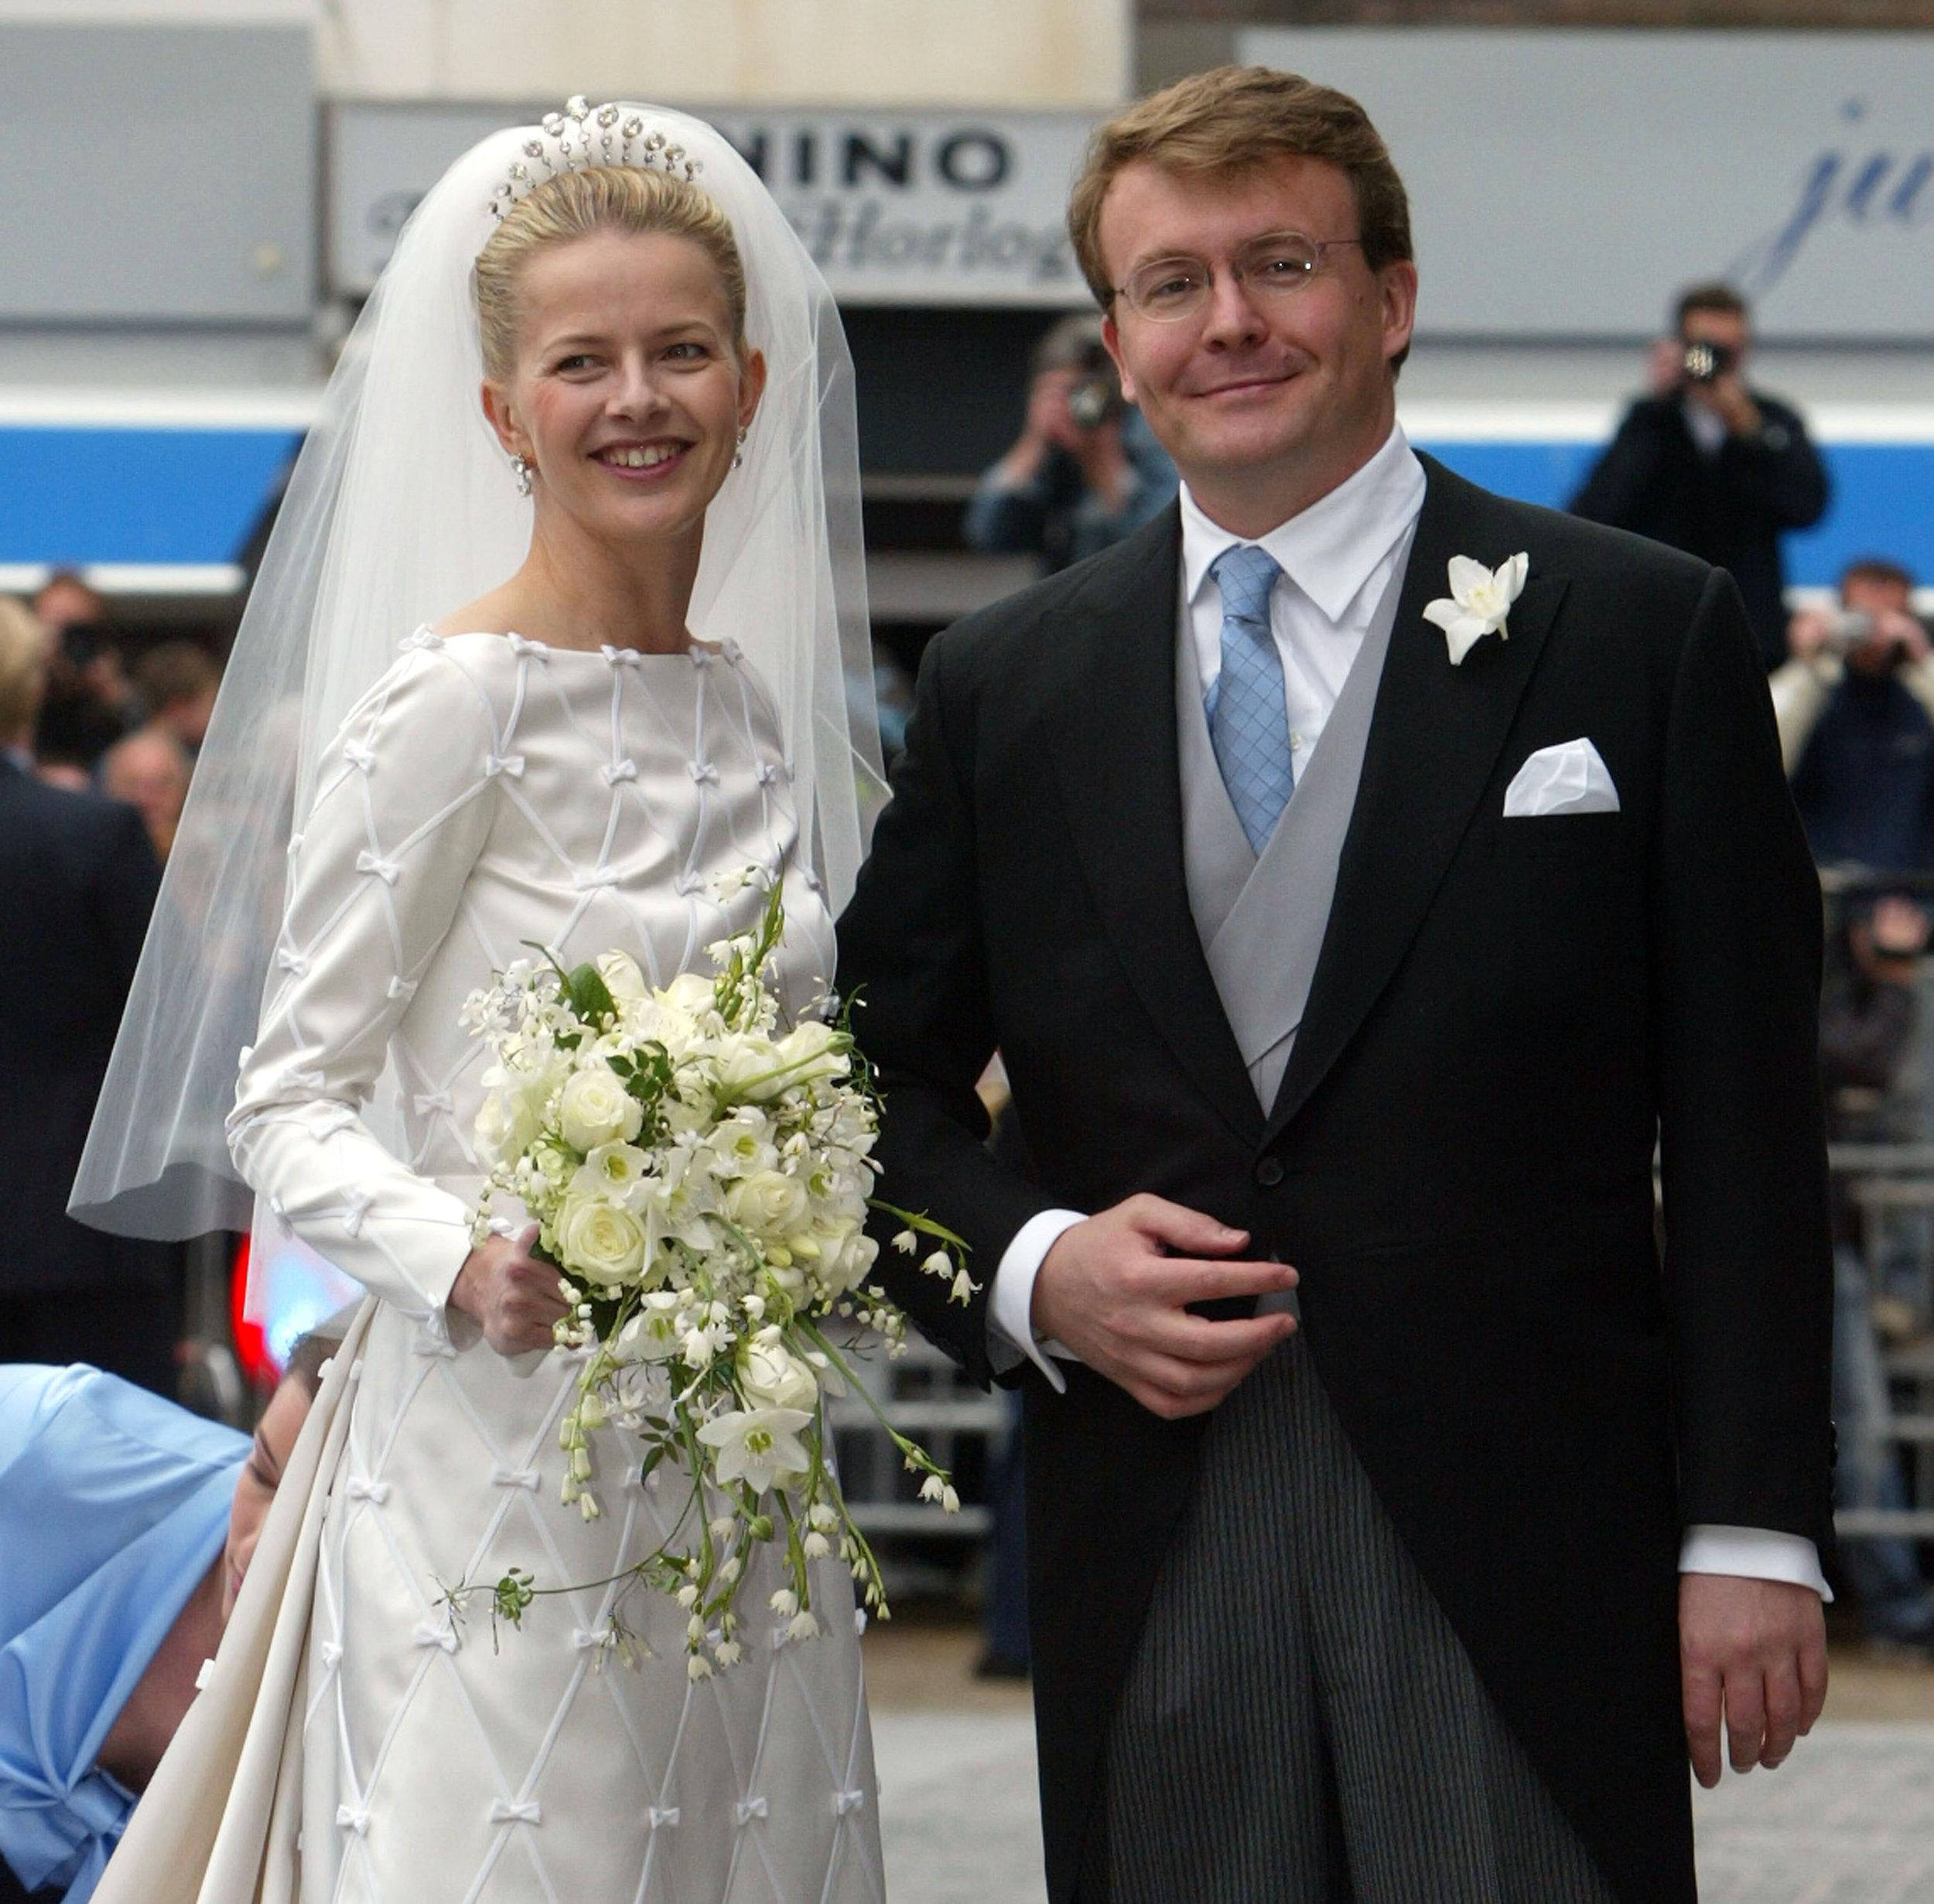 Am 24. April 2004 heiratete Prinz Friso seine große Liebe Mabel.  ©Getty Images